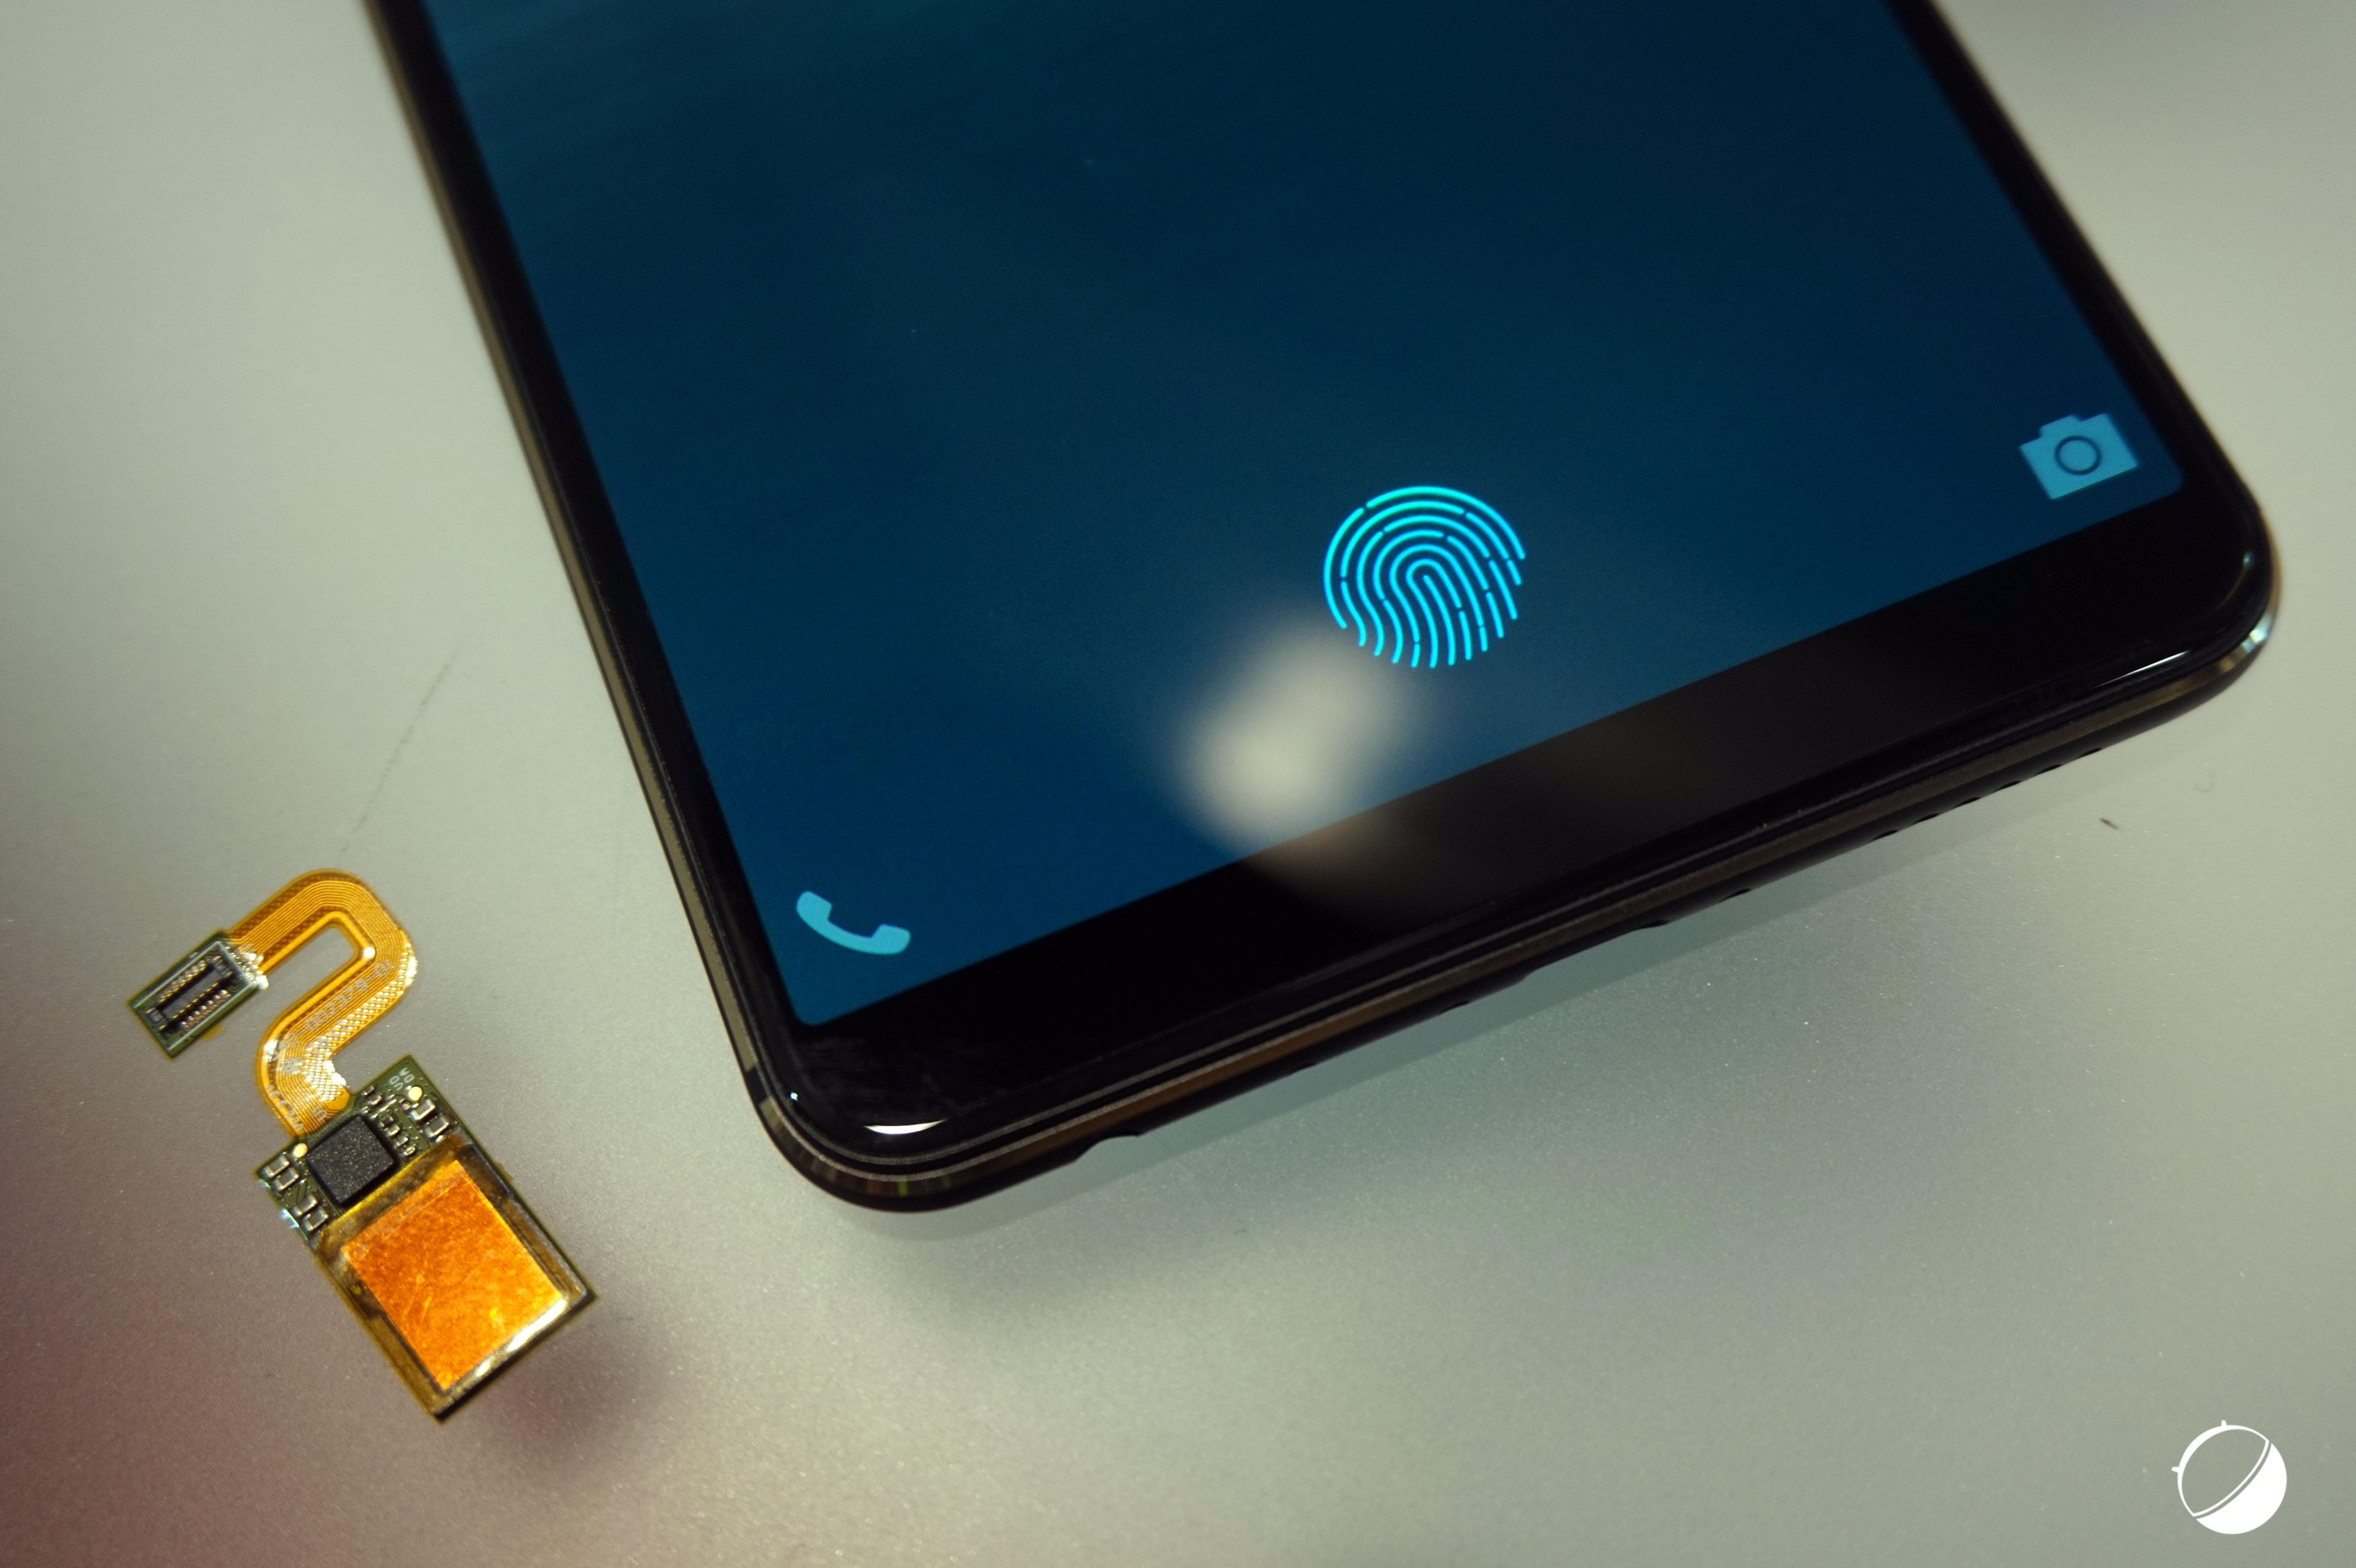 Un Xiaomi Mi 7 avec scanner d'empreintes sous écran ? Des insinuations qui en disent long